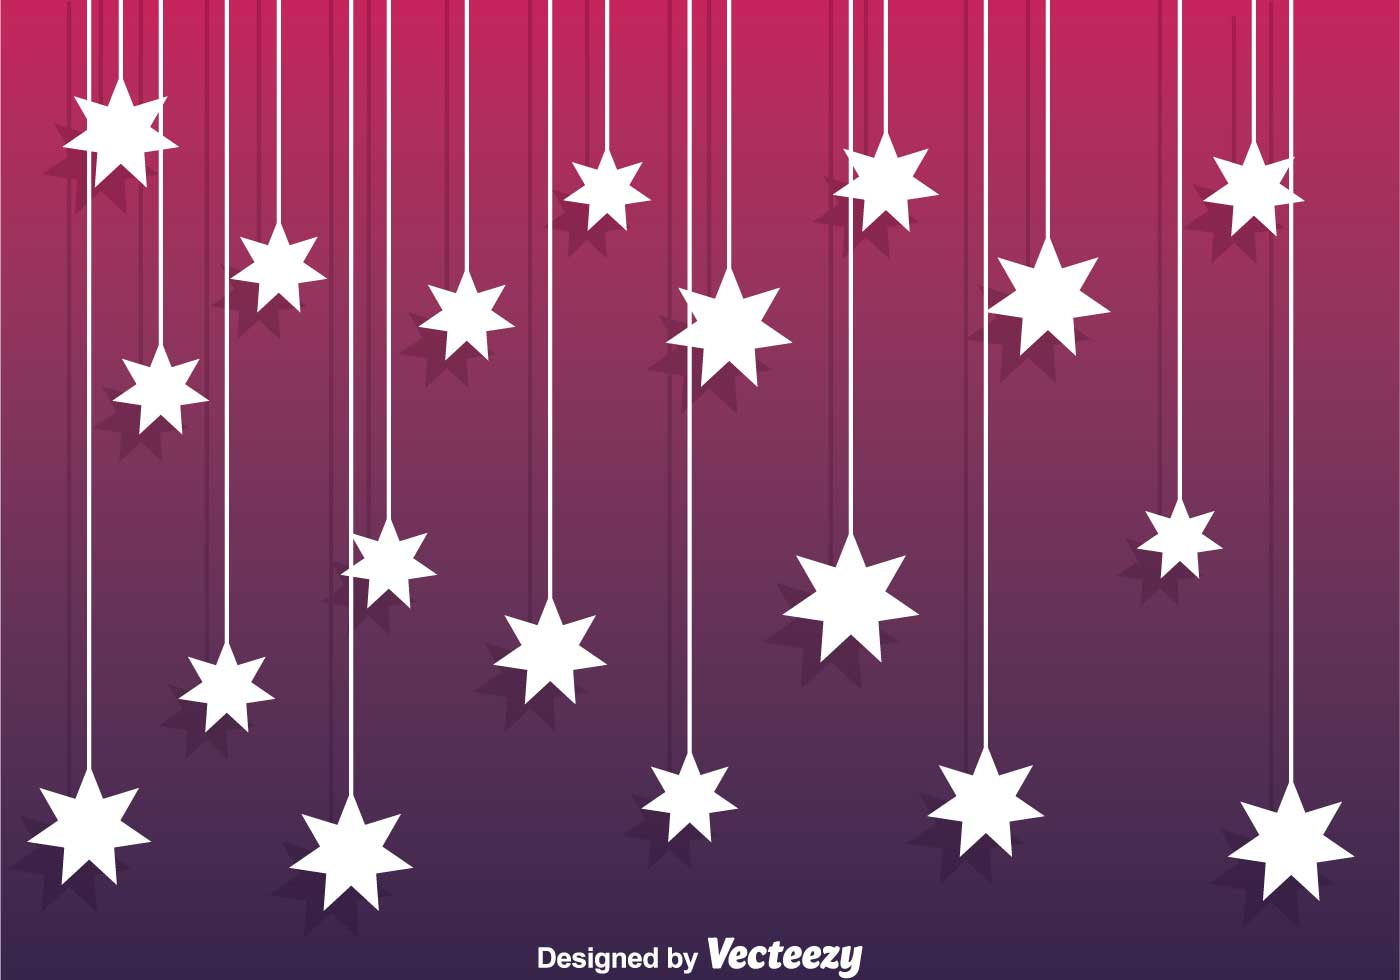 Wallpaper Falling Stars Falling Star Background Vector Download Free Vector Art